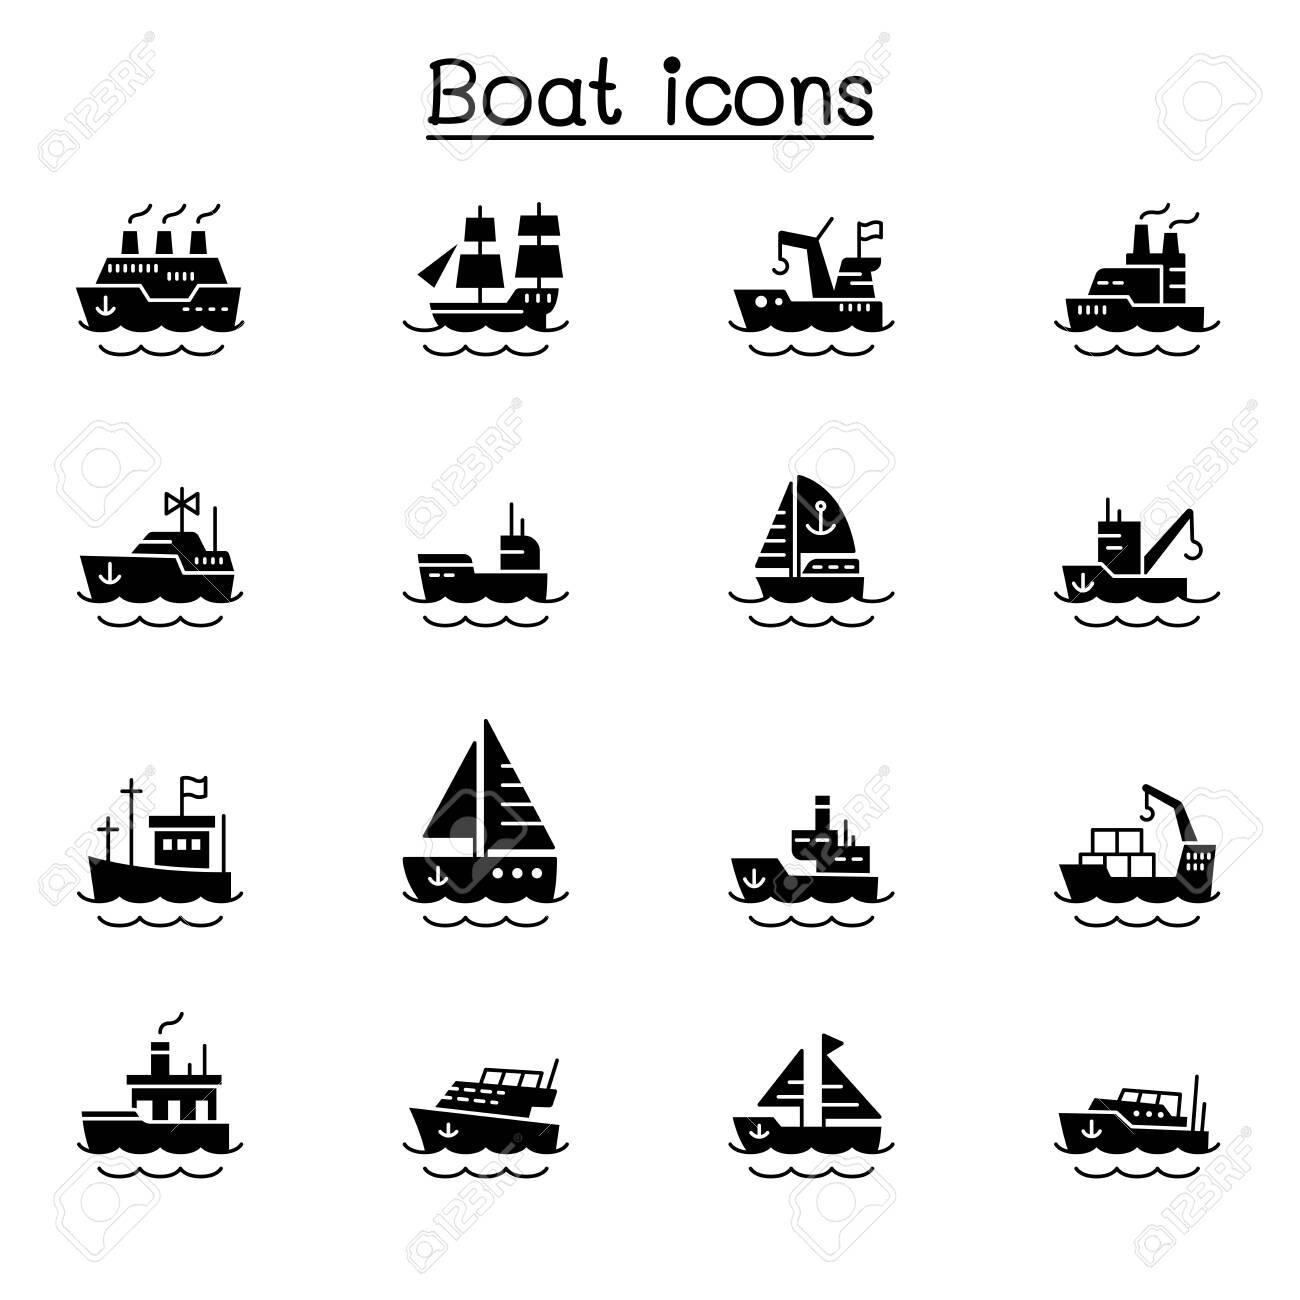 Boat icons vector illustration graphic design - 159450468